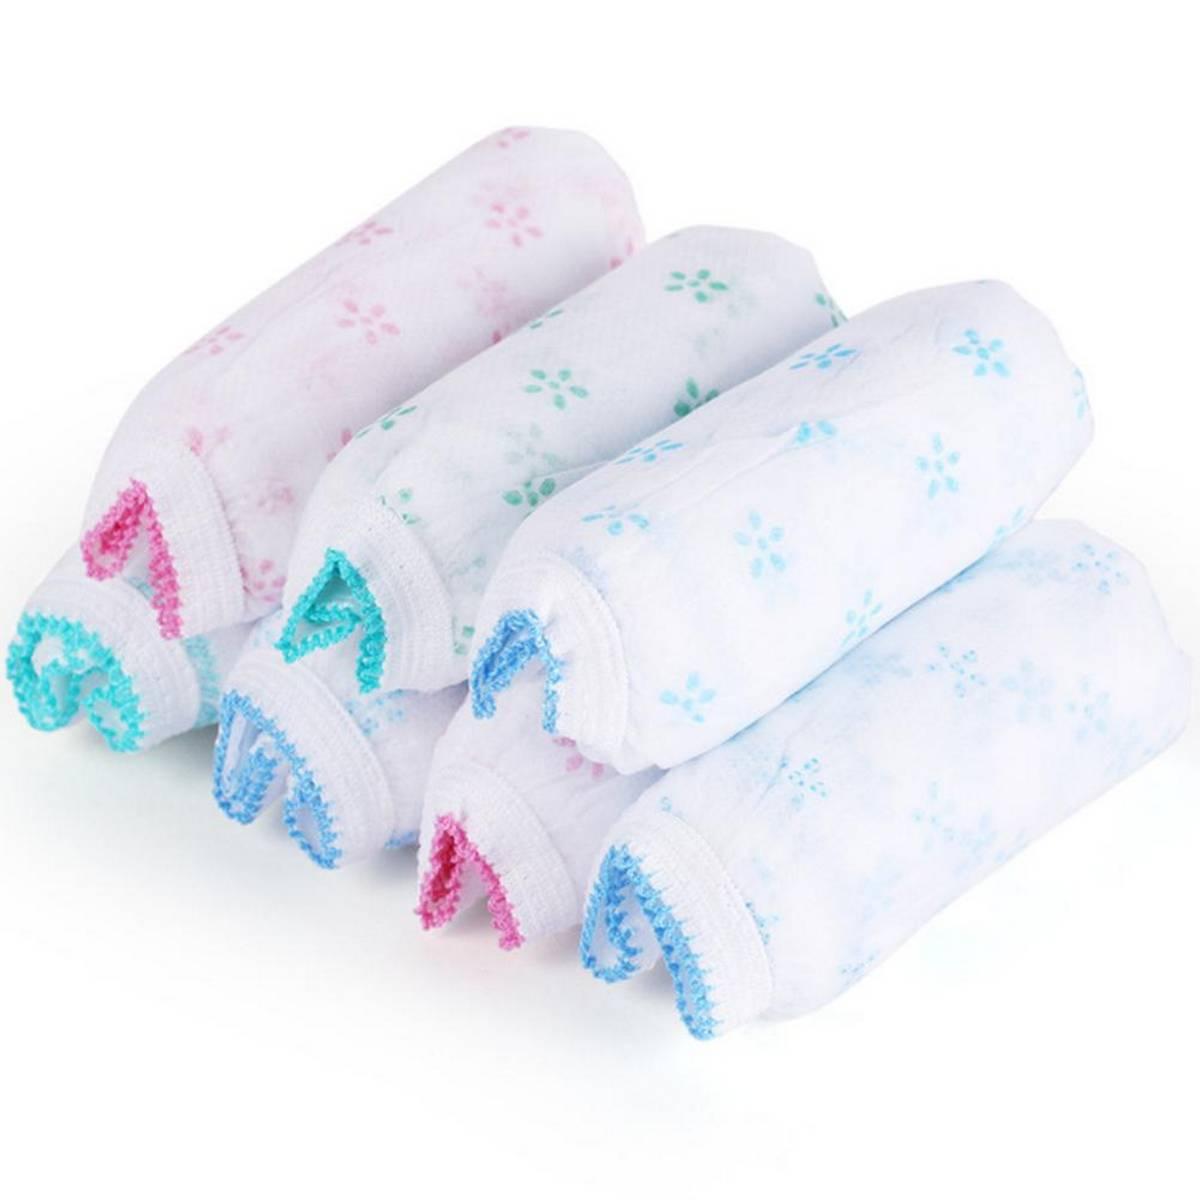 Bindas Secret Pack Of 6 Disposable Brief Panties For Women